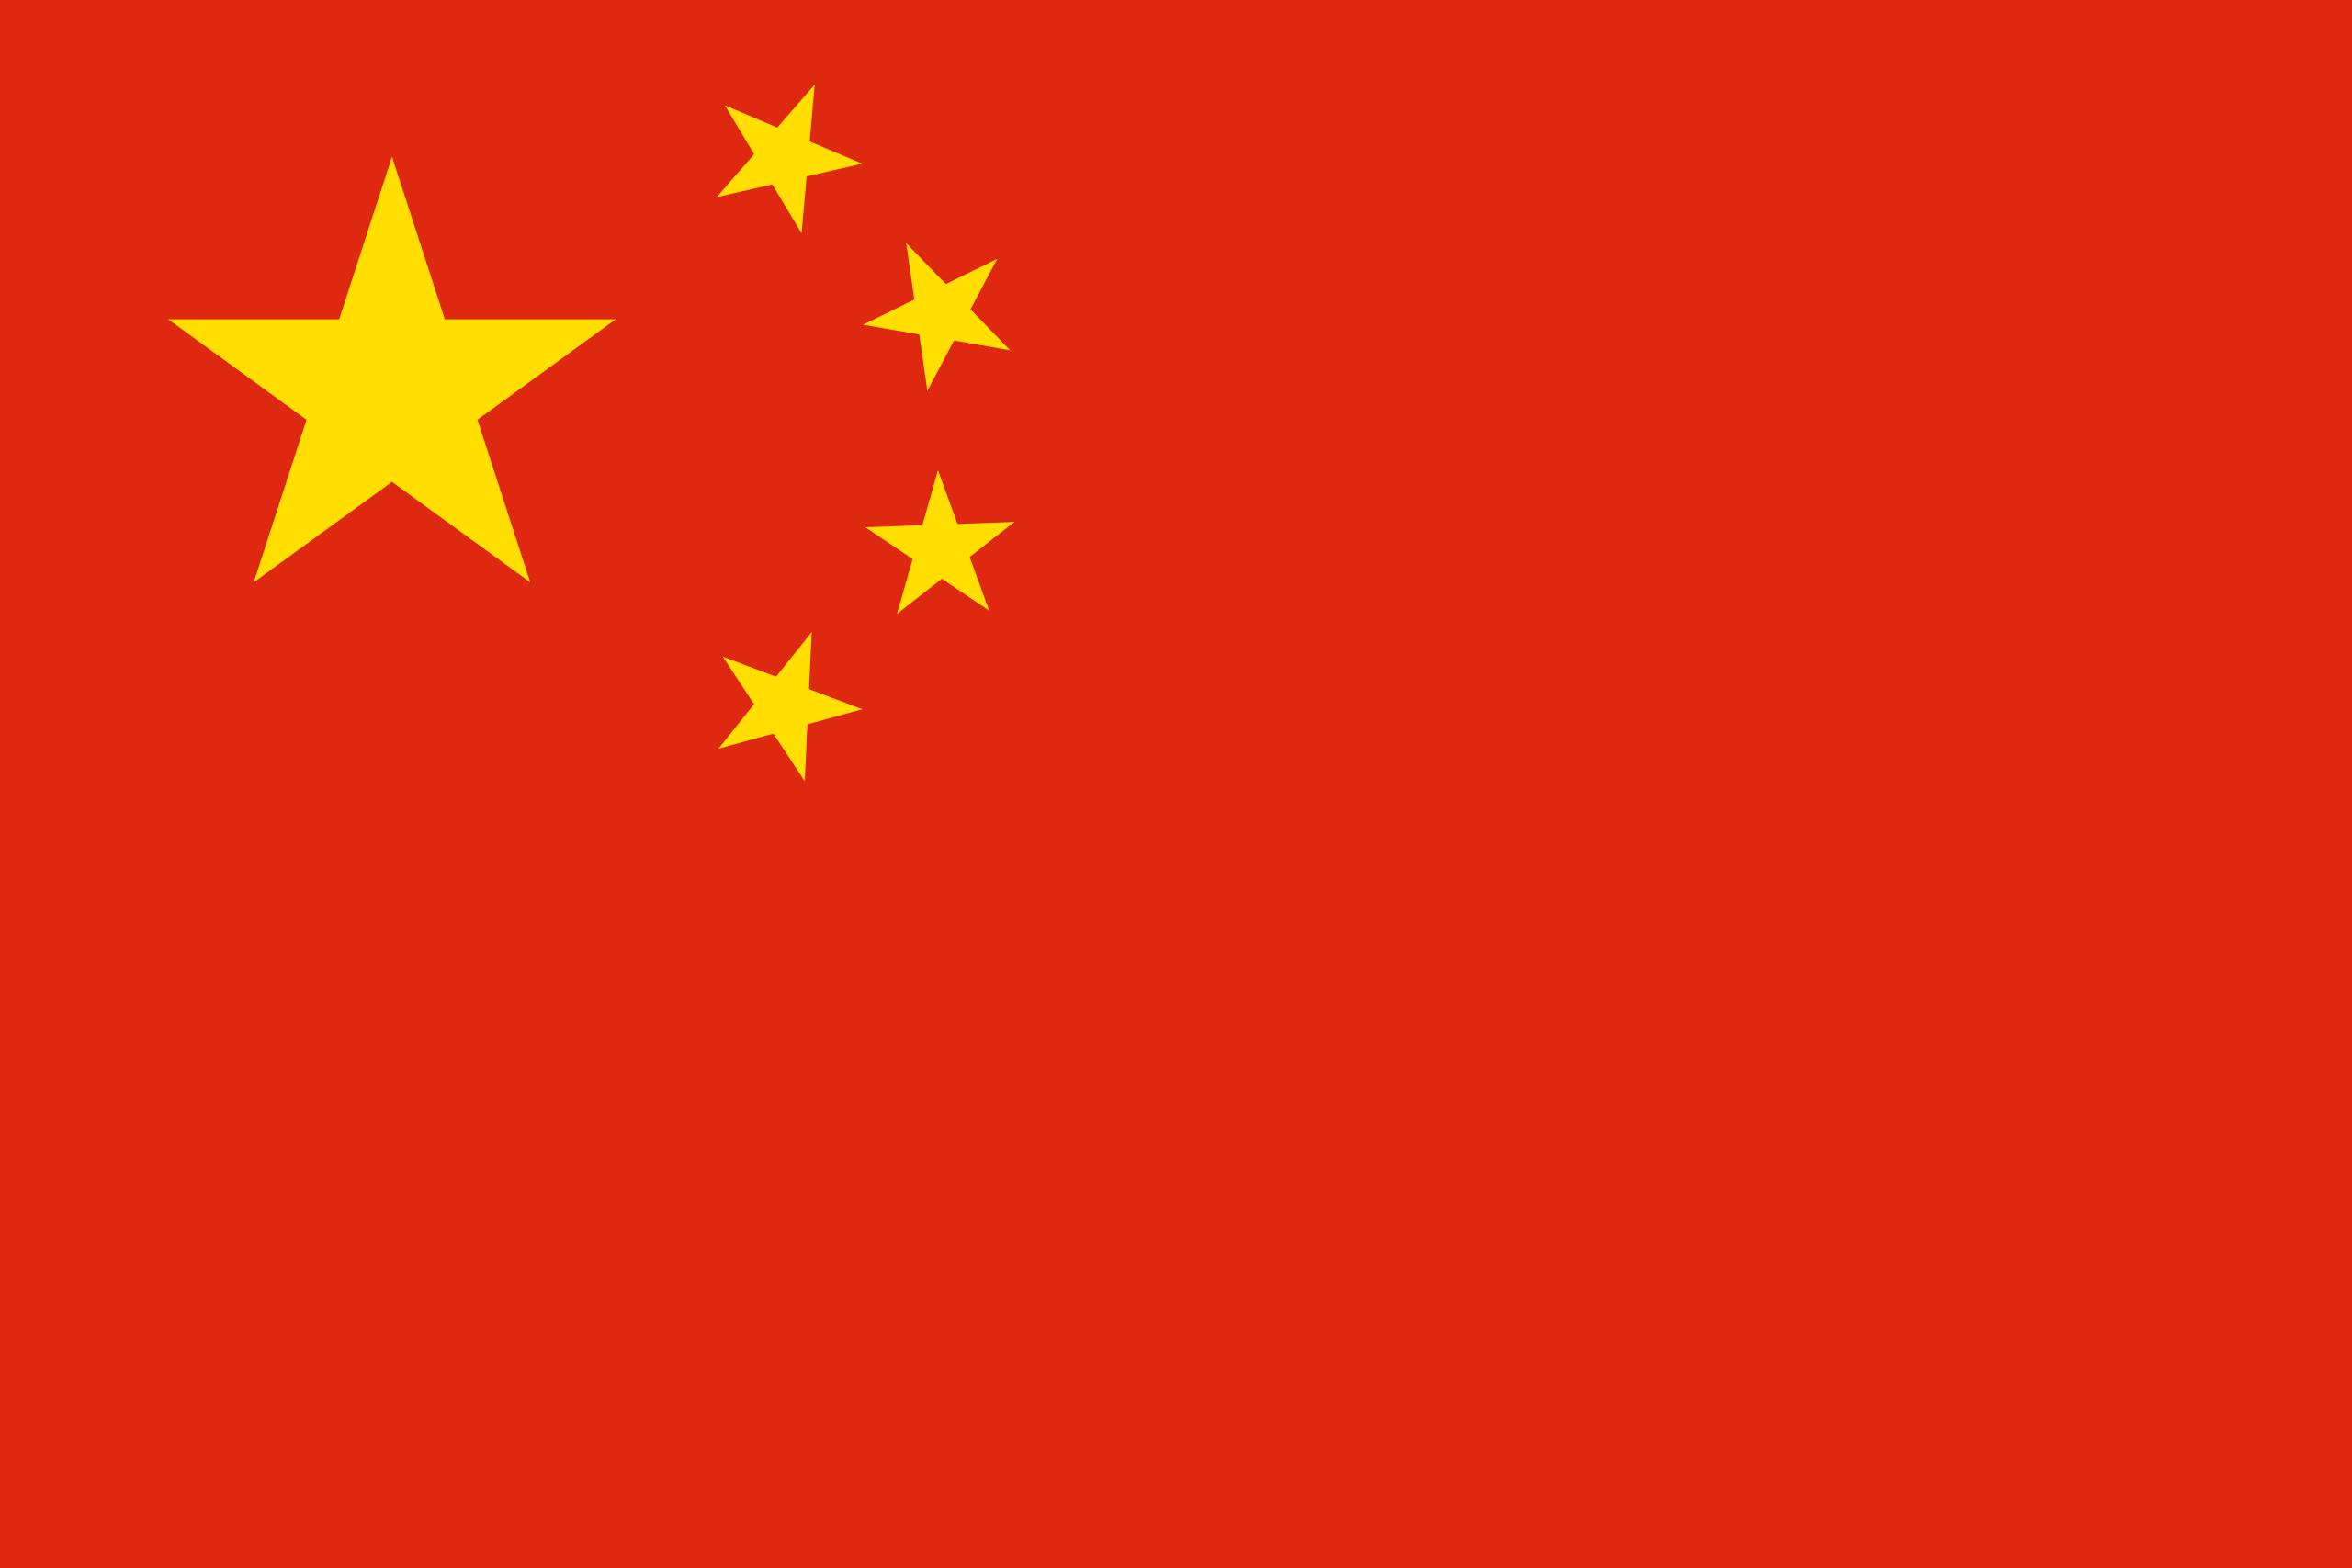 La Chine adopte une législation environnementale